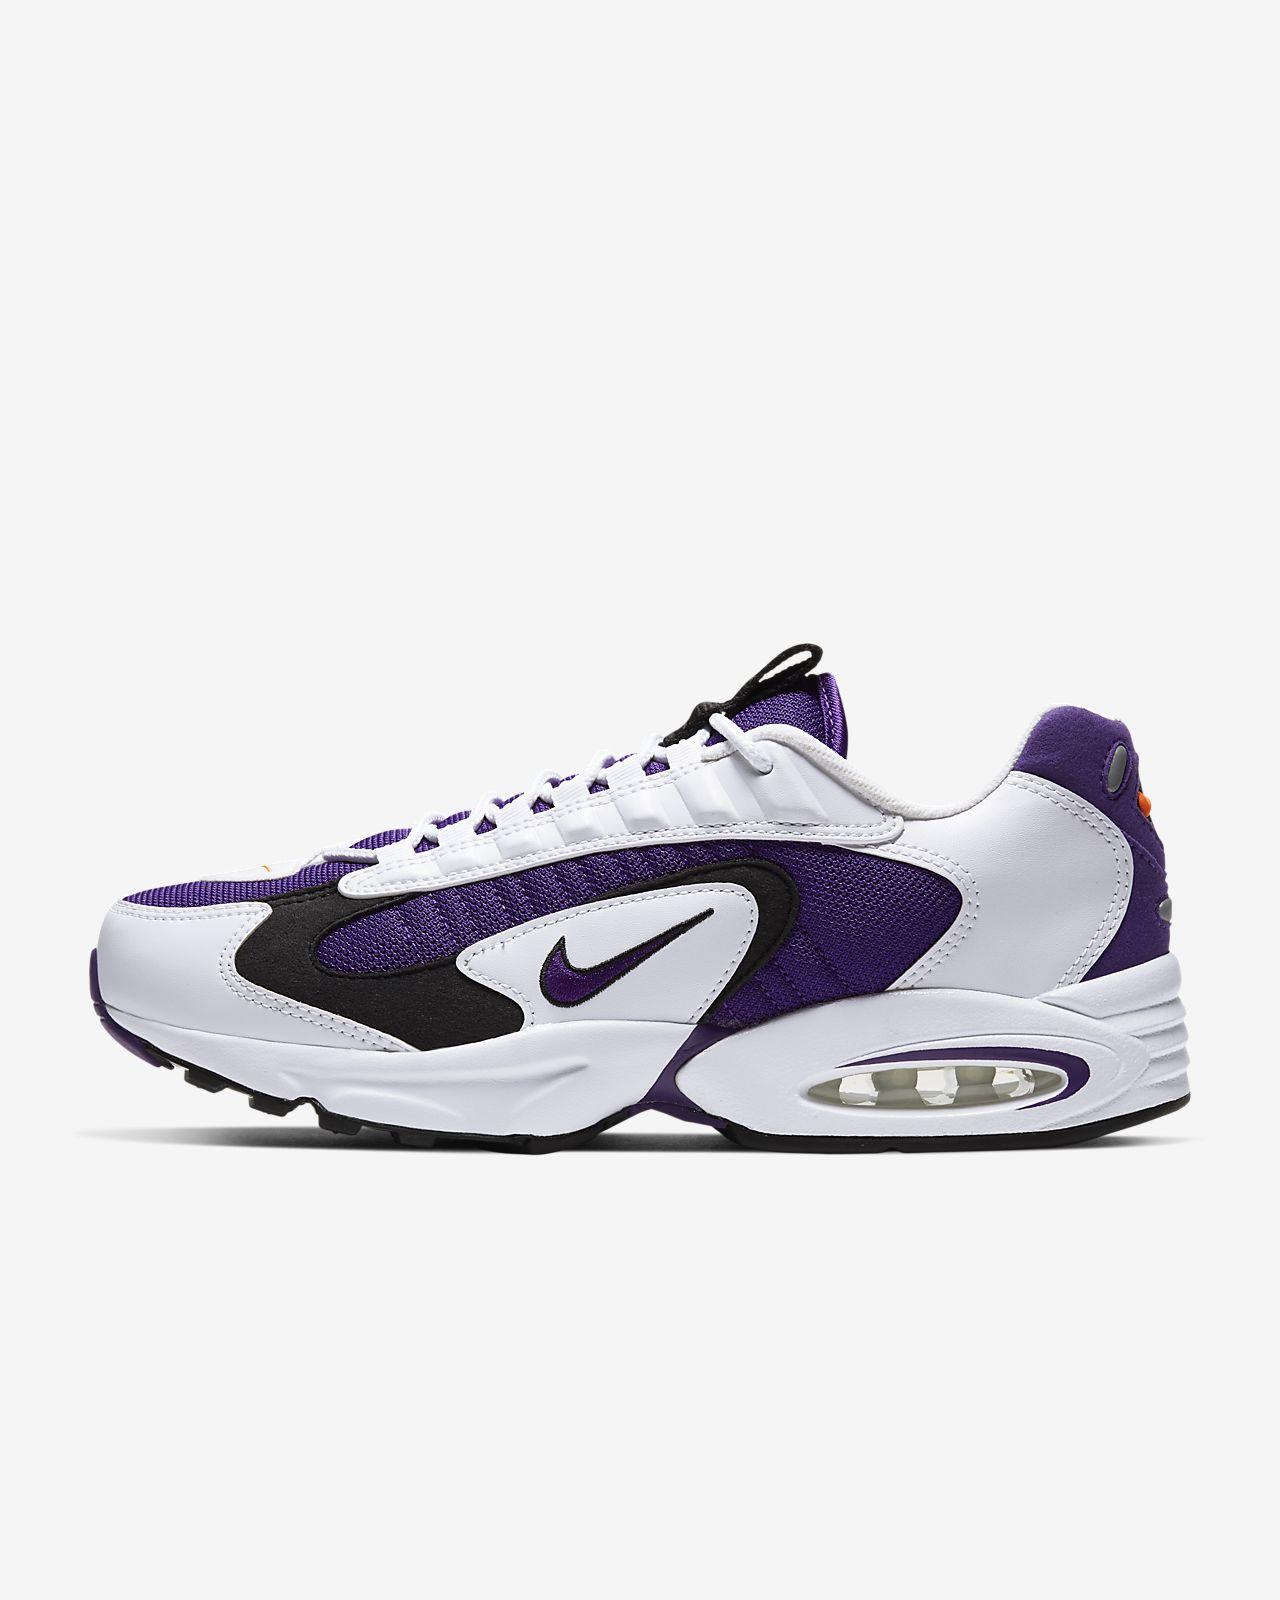 Nike Air Max Triax 男子运动鞋